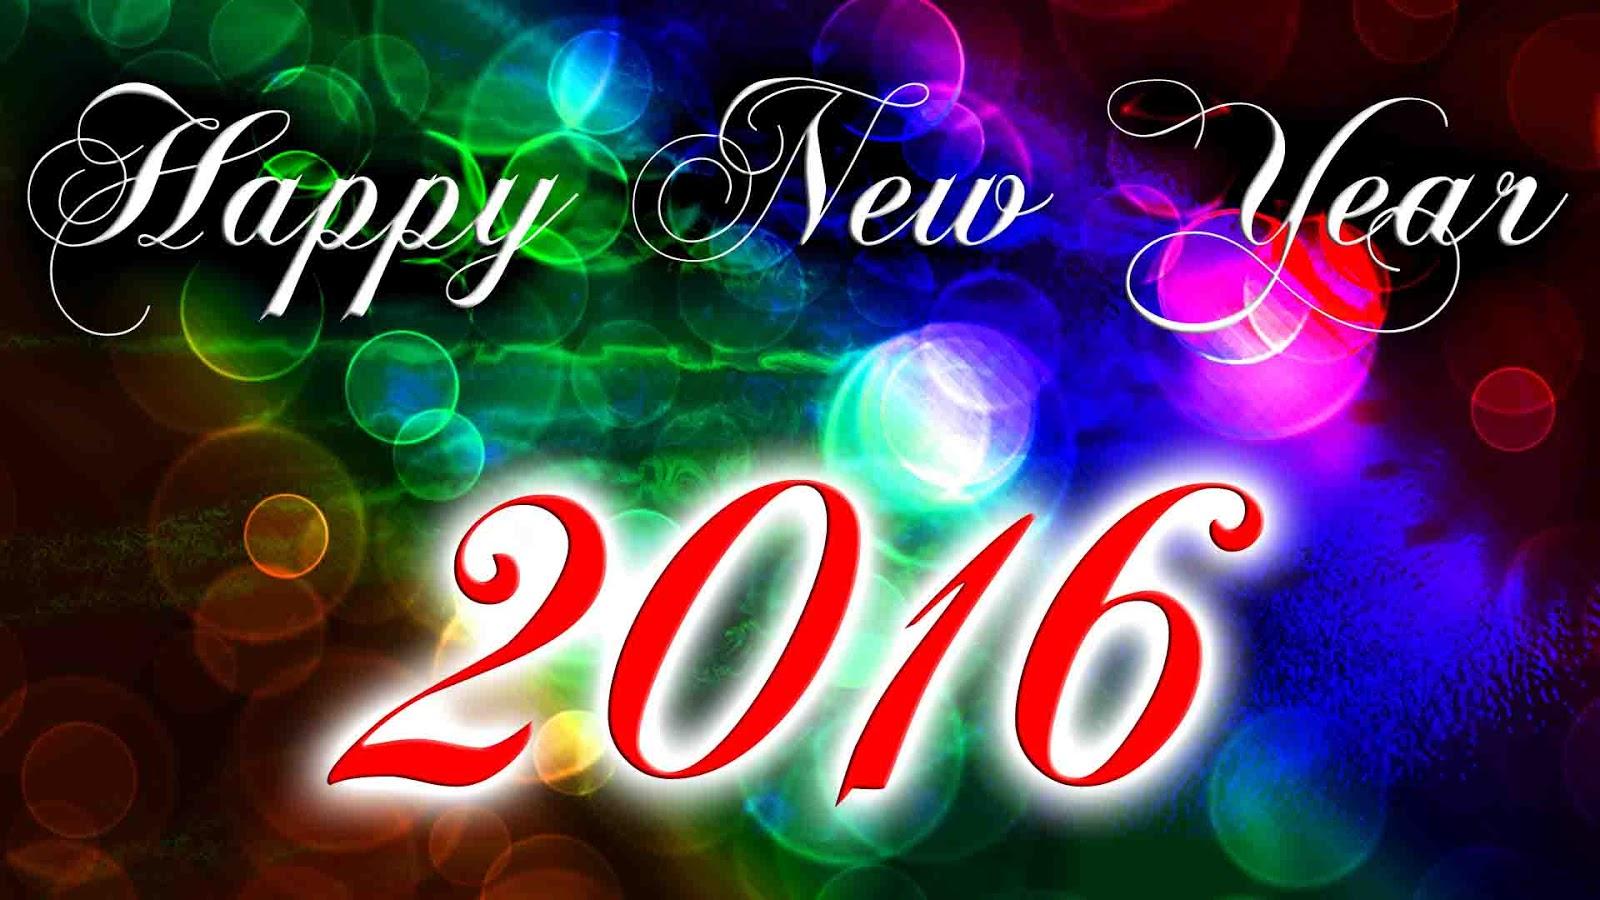 happy new year 2016 wallpaper happy new year 2018